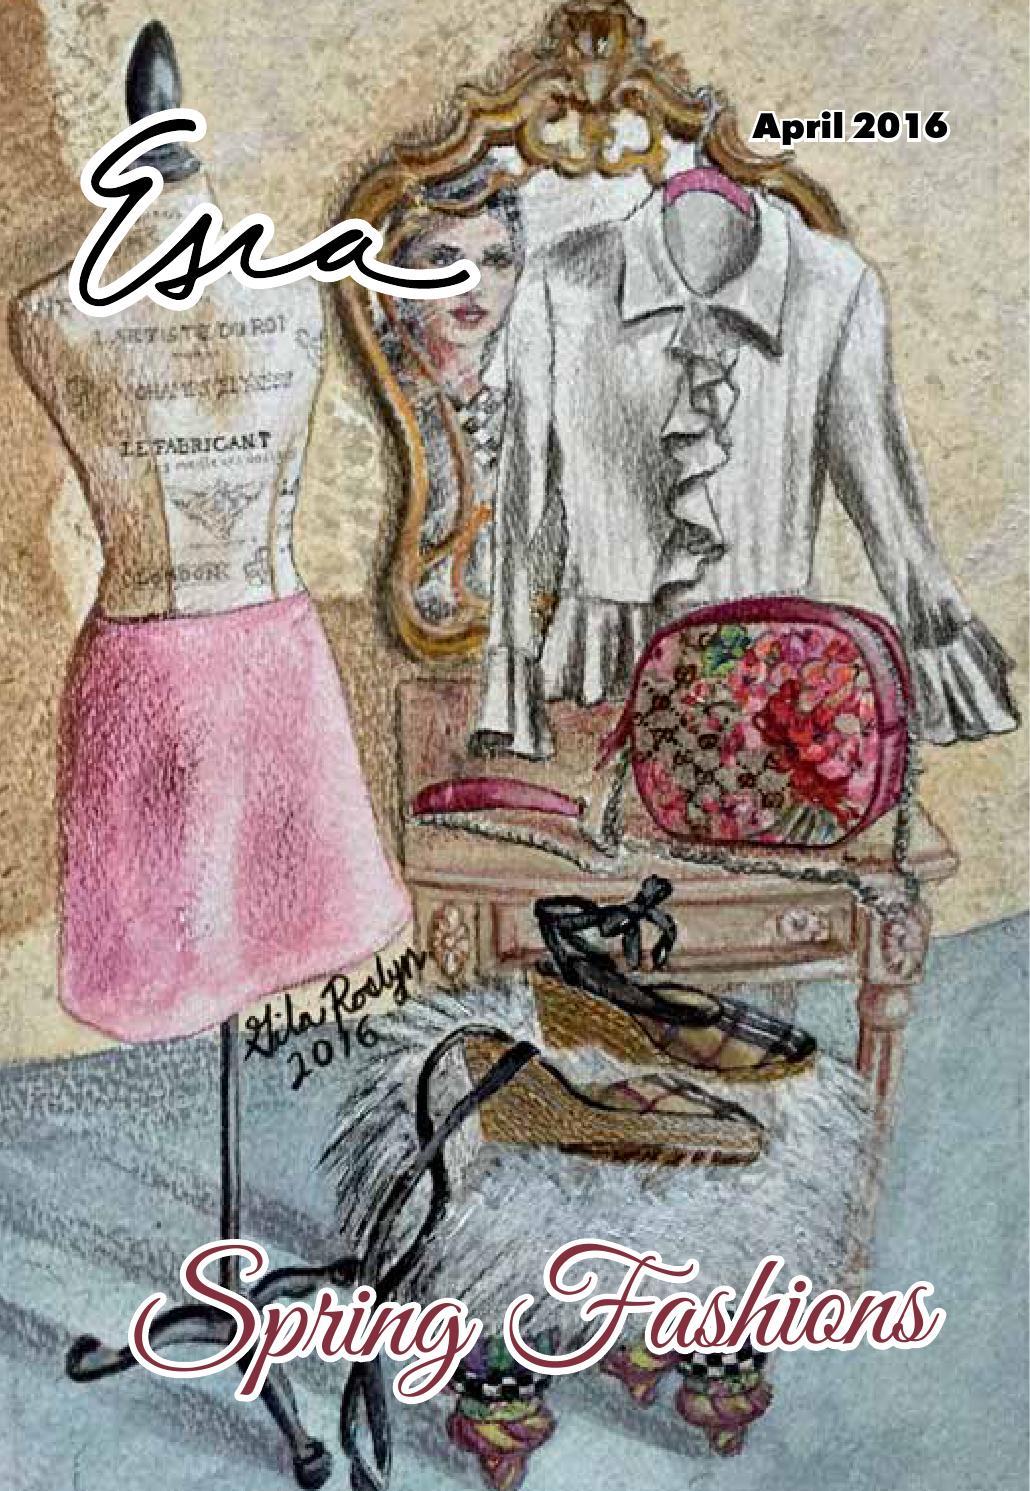 Esra April 2016 - Spring Fashions by Esra Magazine Online - issuu